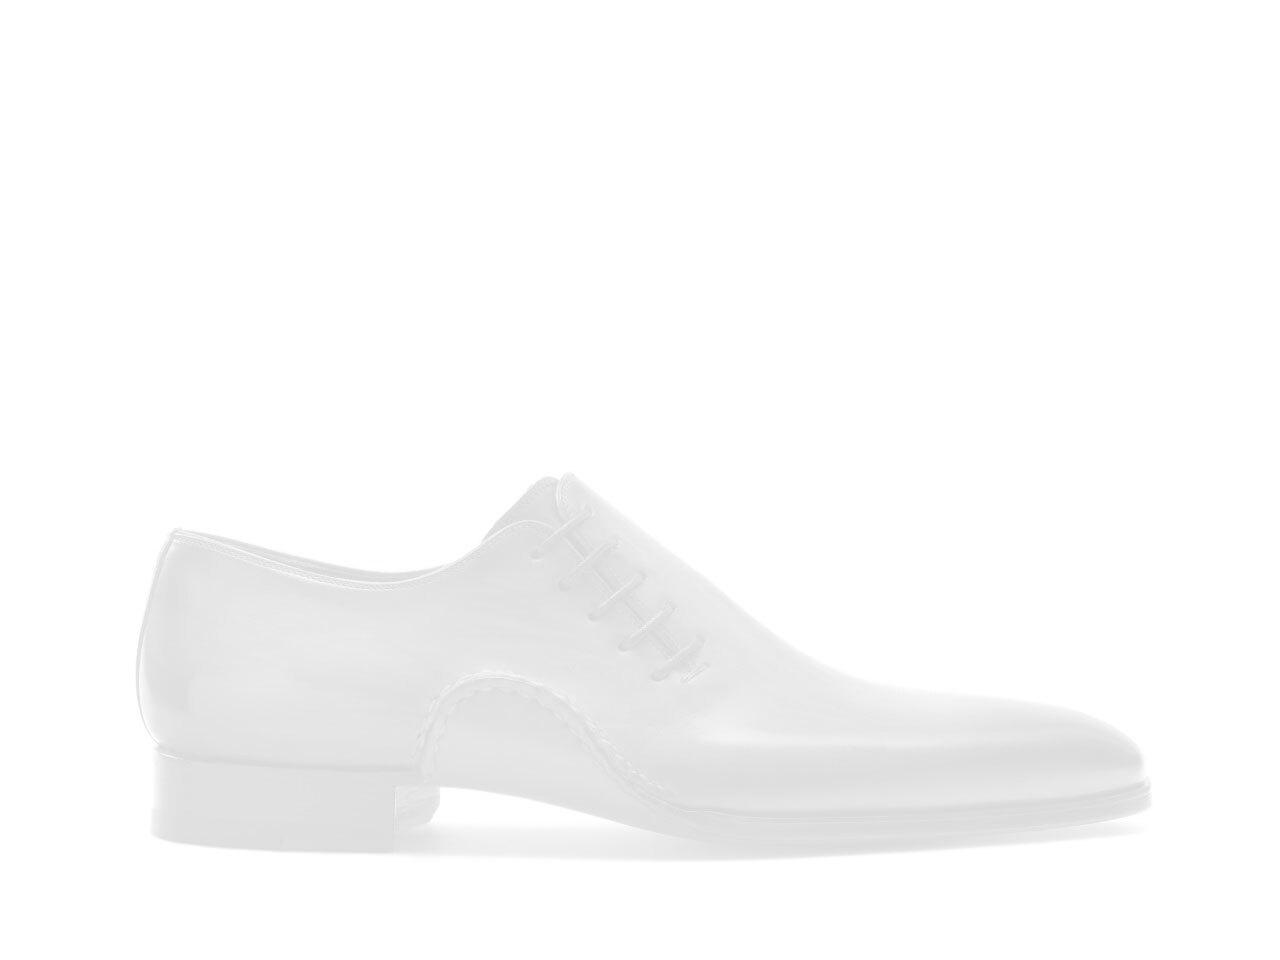 Sole of the Magnanni Herrera Cuero Men's Comfort Dress Shoes